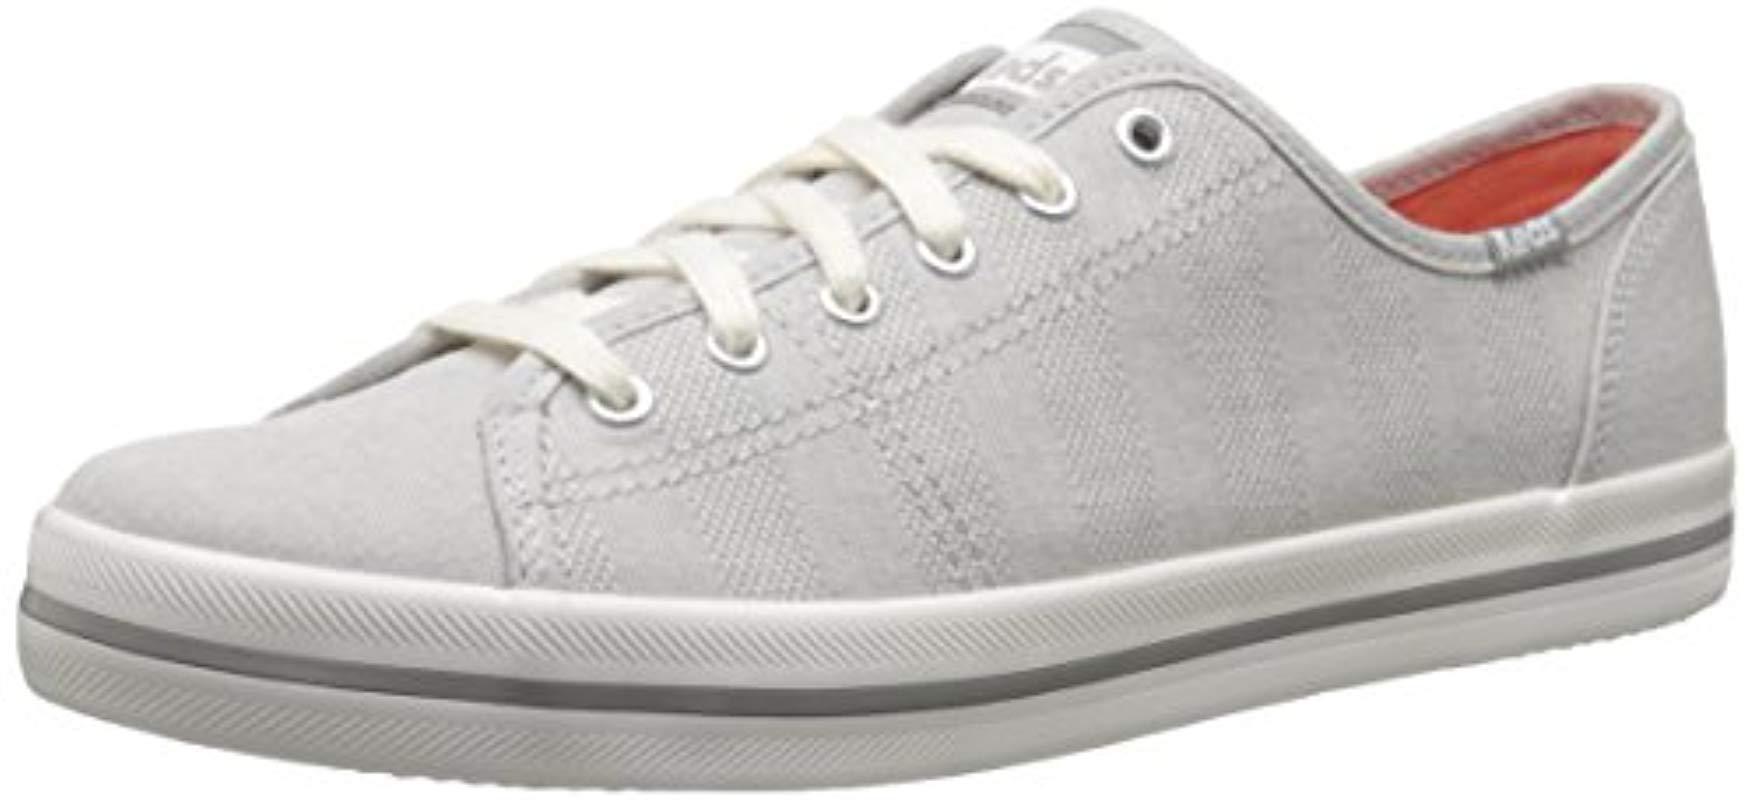 0aa372fdd6b Lyst - Keds Kickstart Fashion Sneaker in Gray